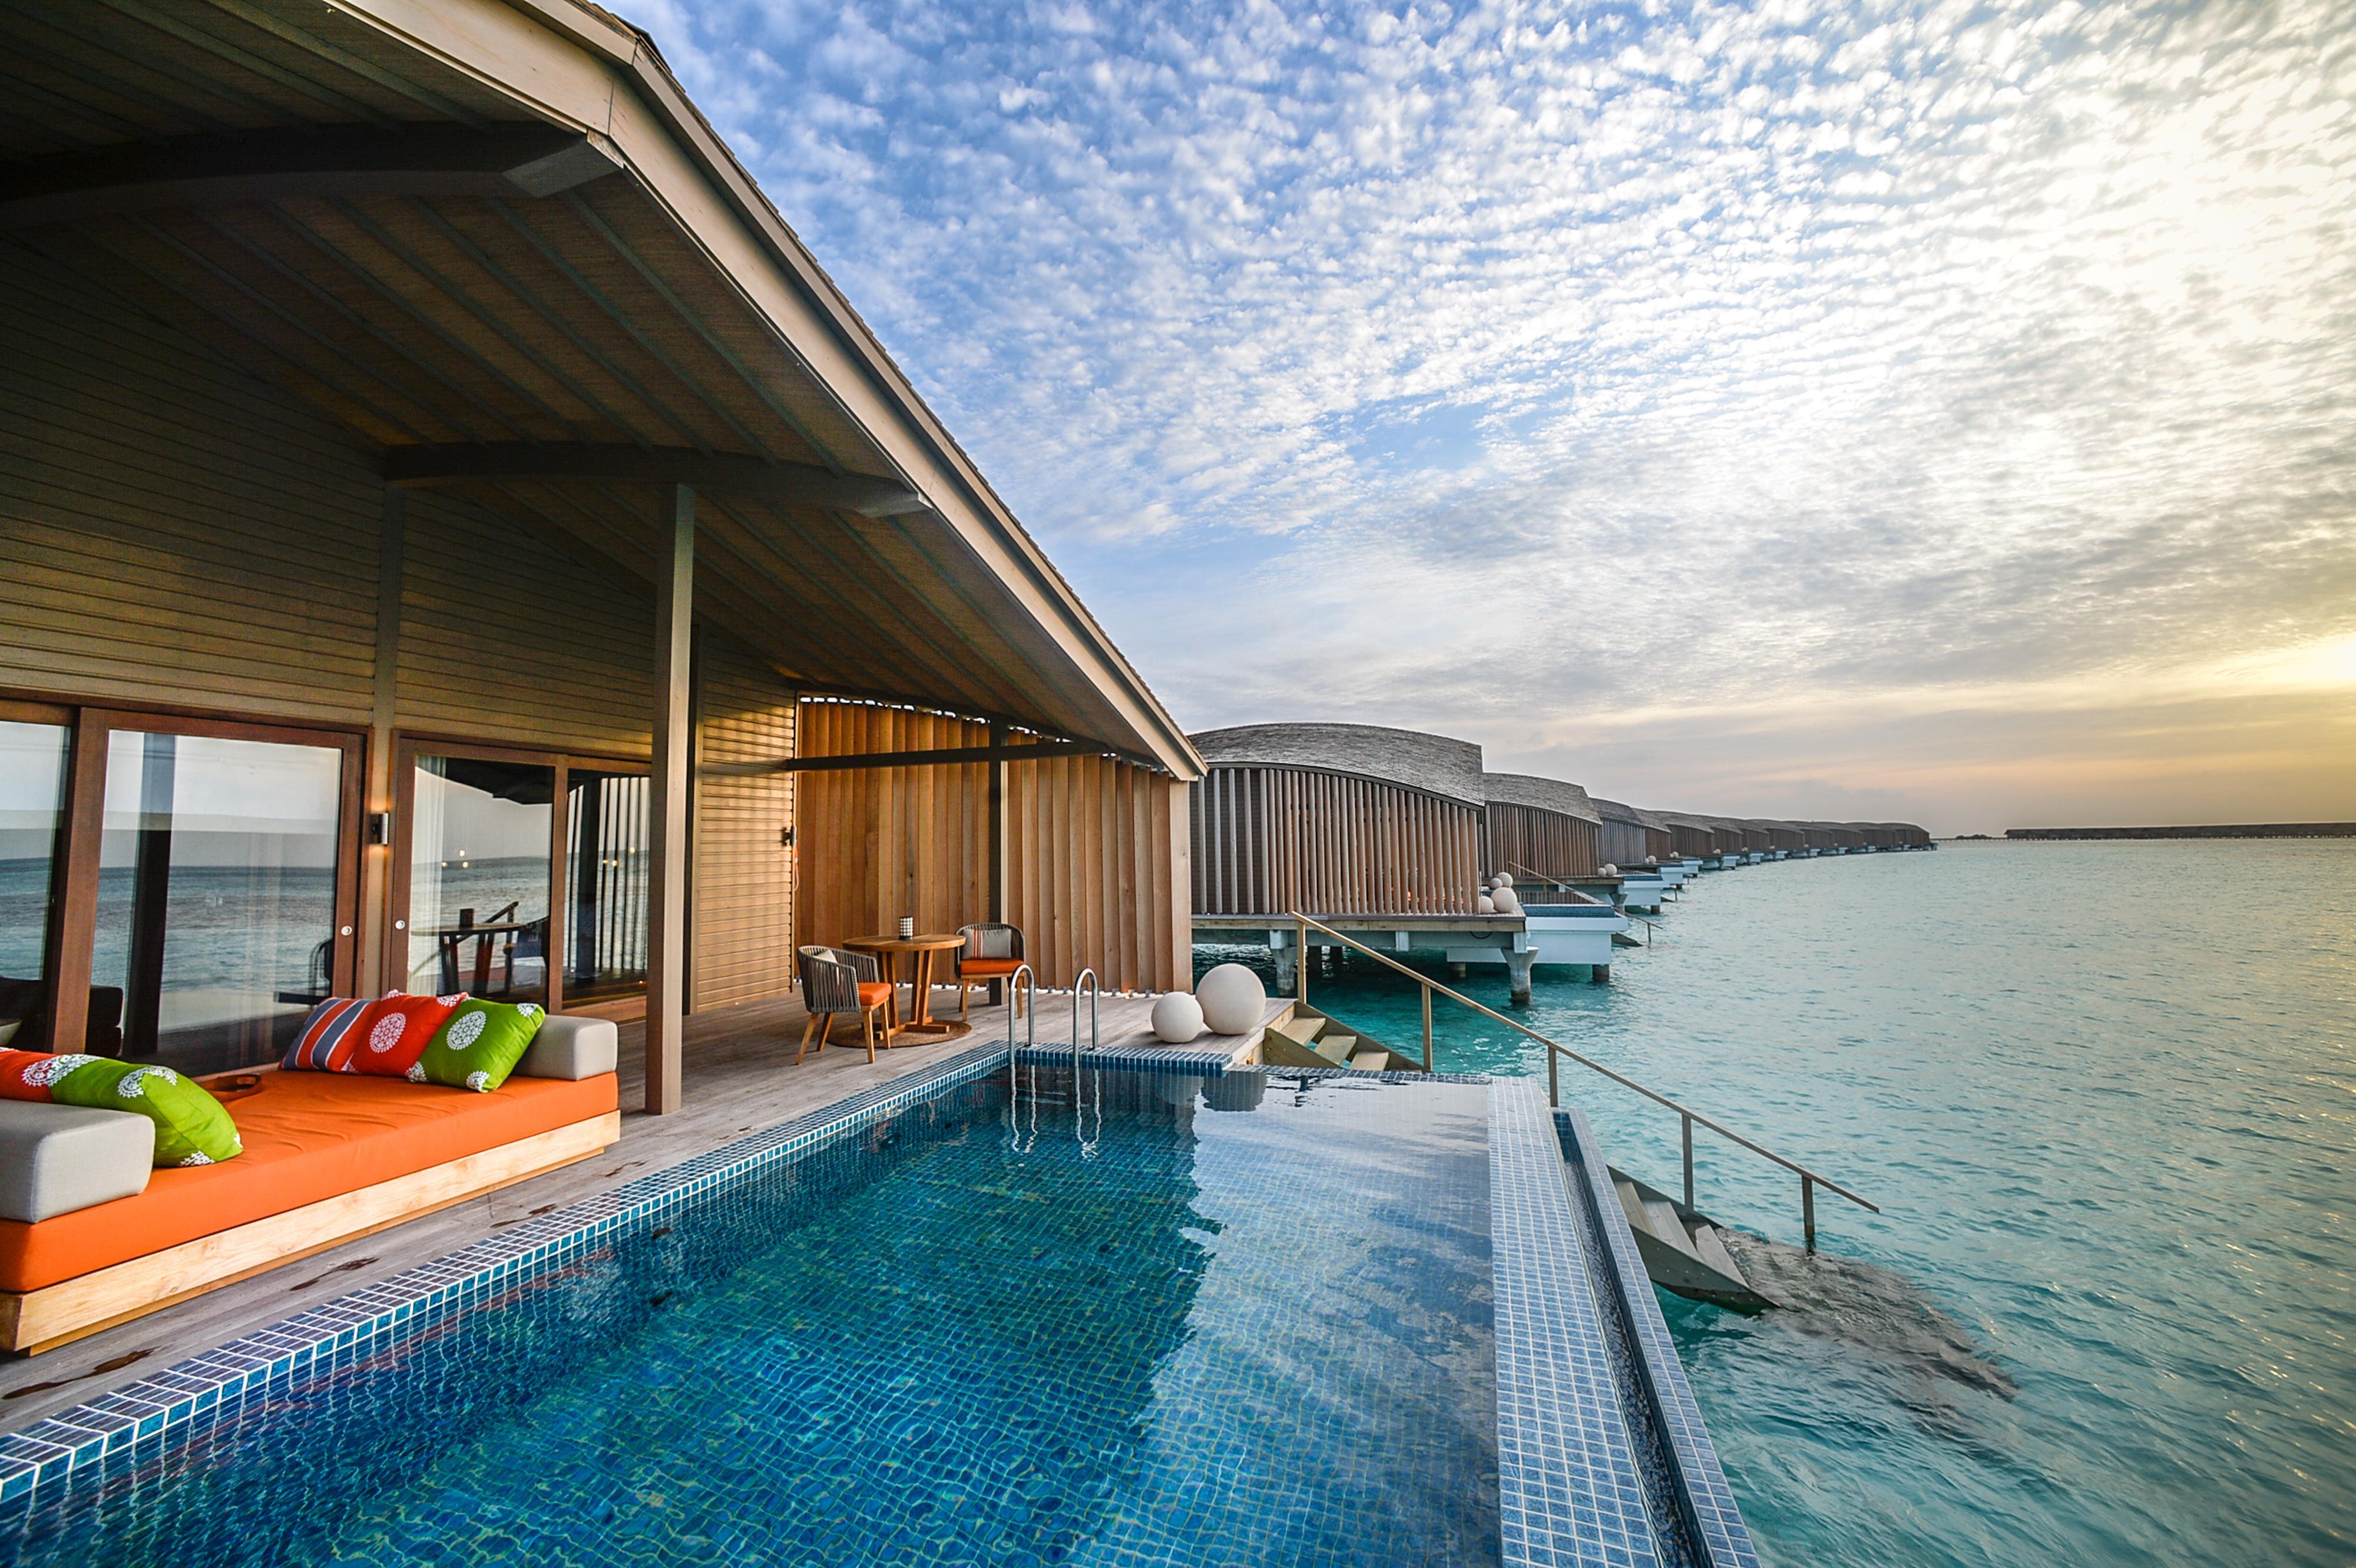 Club Med芬尼芙別墅擁有52棟頂級別墅,每座別墅均擁有私人泳池及寬敞空間,更配有專屬管家提供客製化尊寵服務。